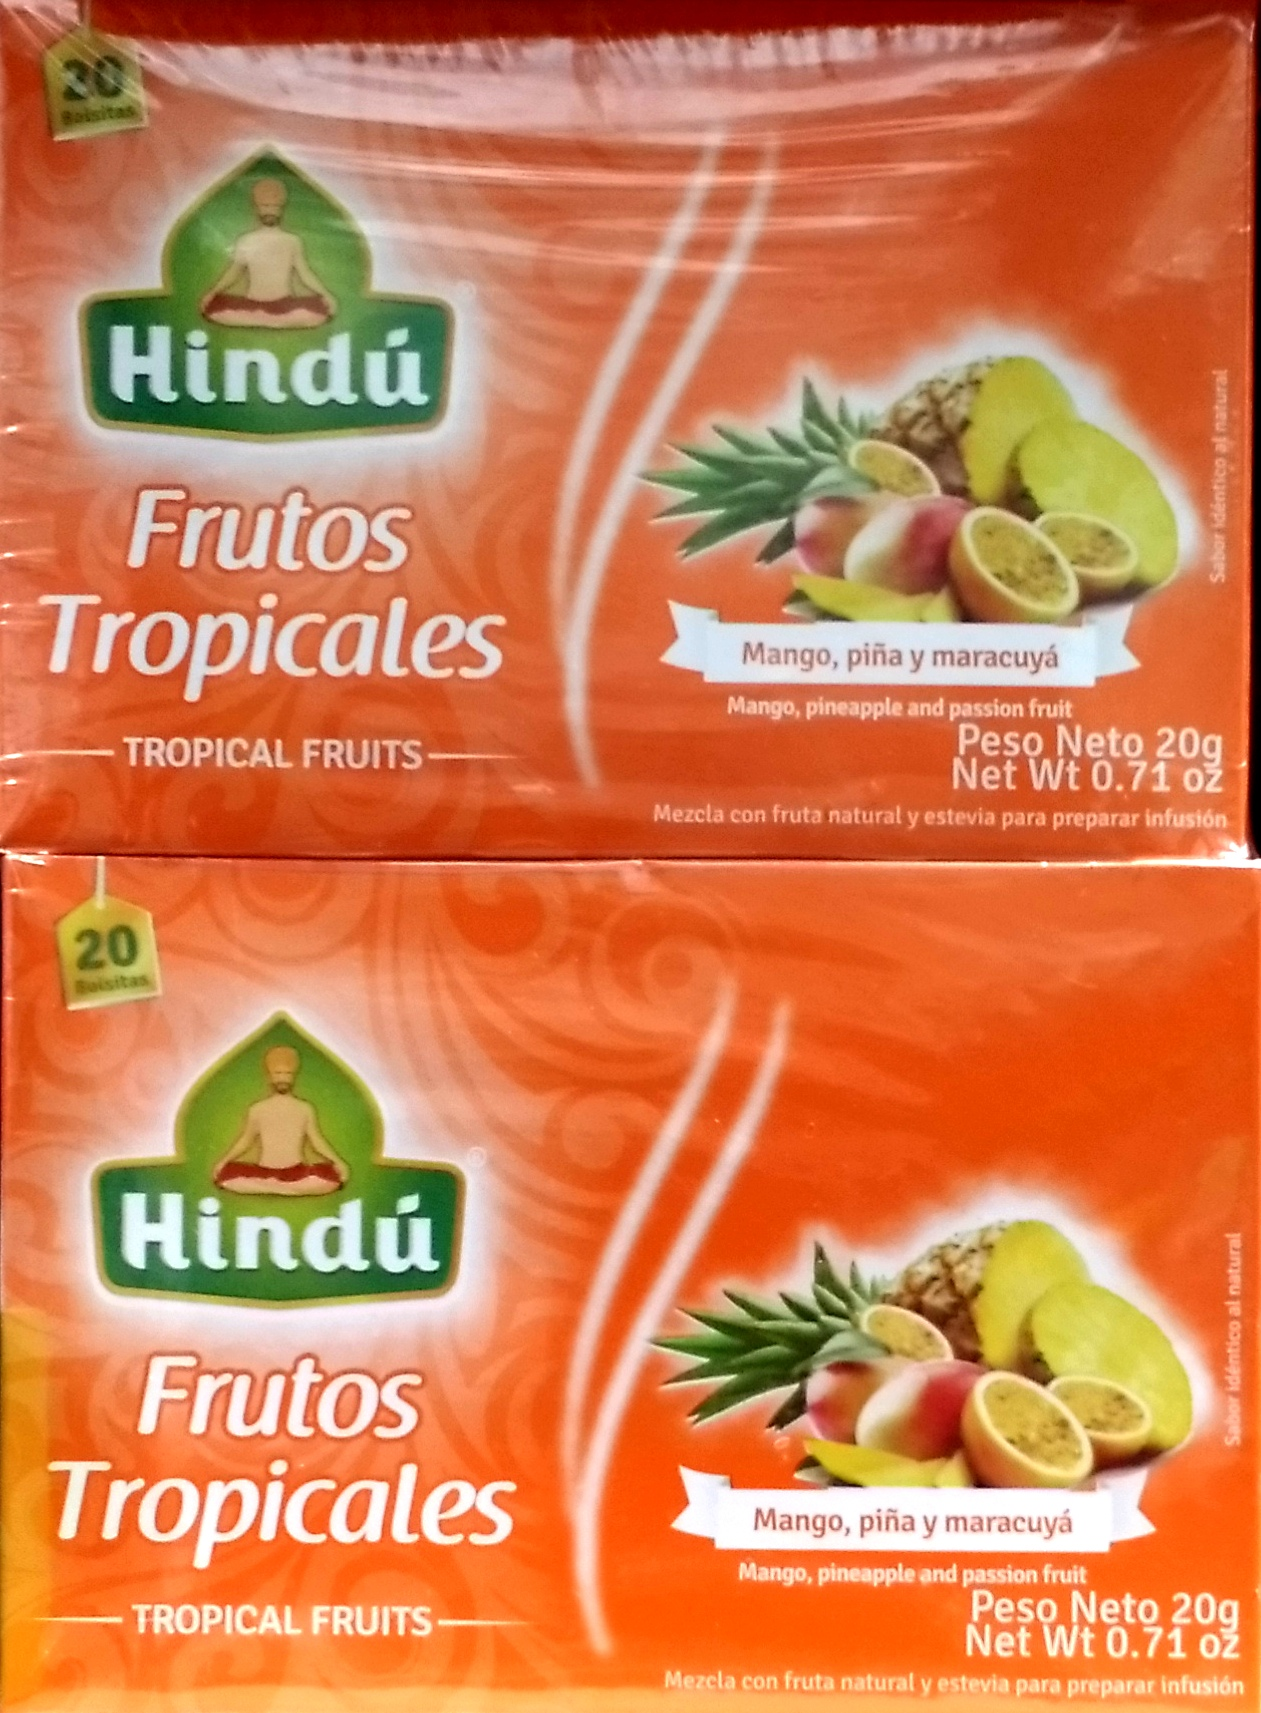 Infusion Hindu Frutos Tropicales 20ux2 40g